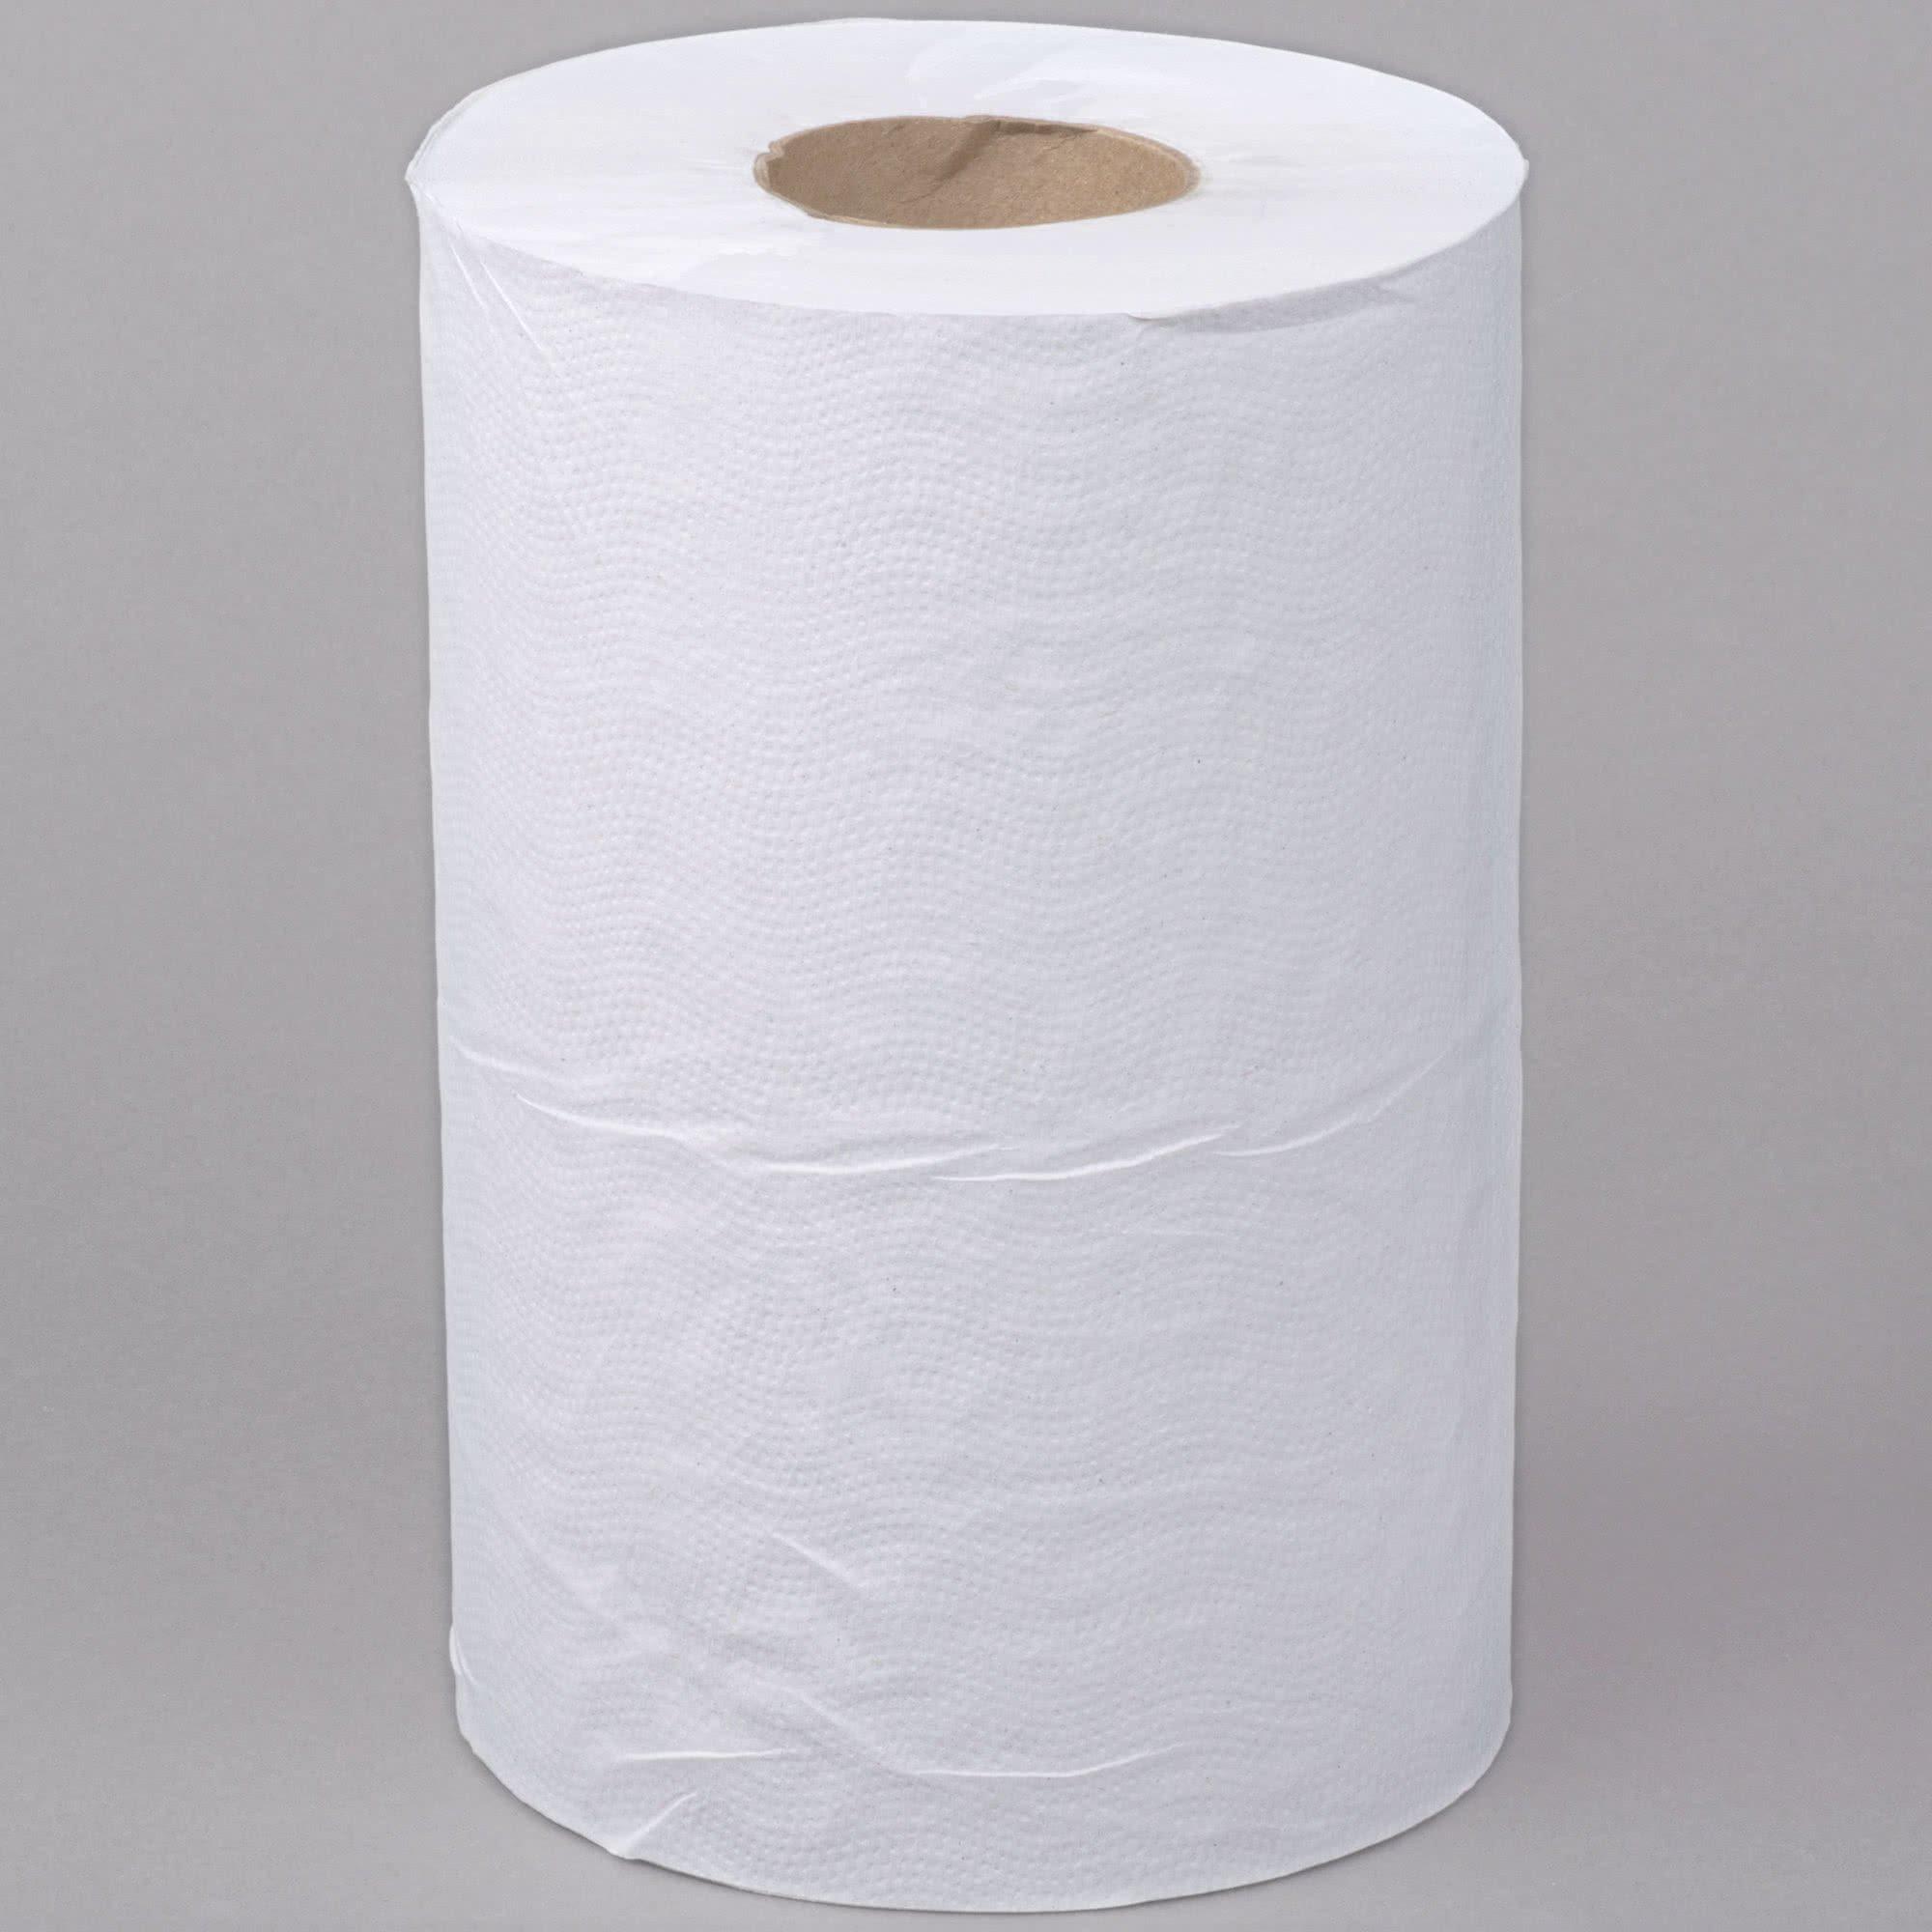 TableTop King White Roll Towel 350 Feet / Roll - 12/Case